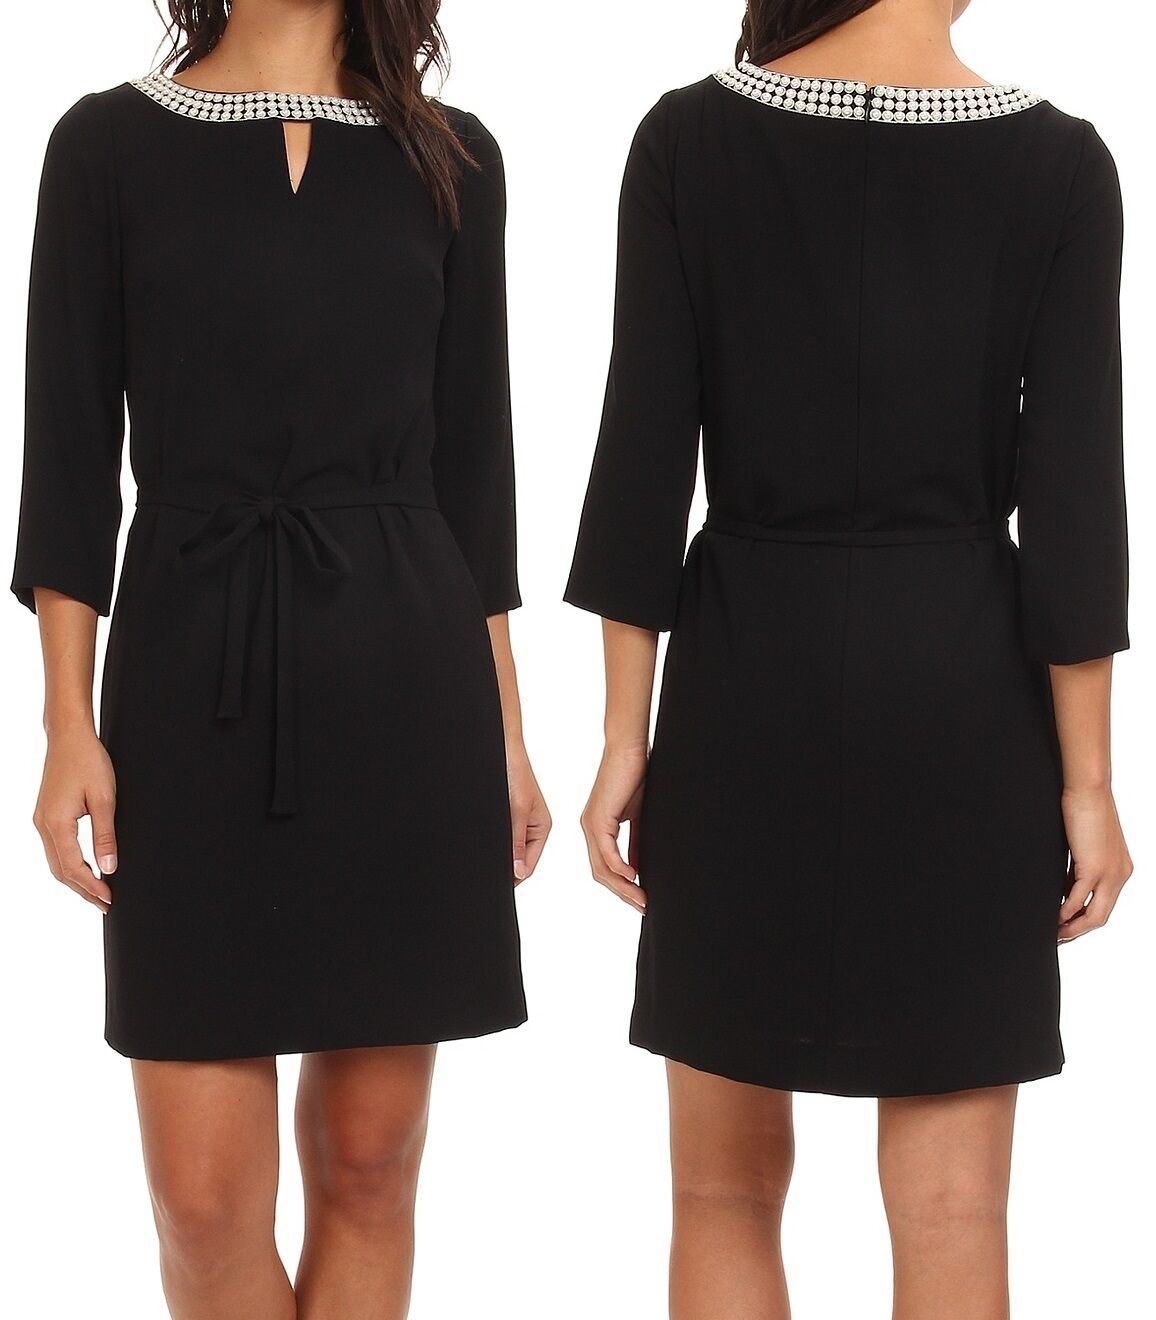 Tahari 4220M179 schwarz Pearl Neckline Crepe Shift Dress w Optional Belt 2R -